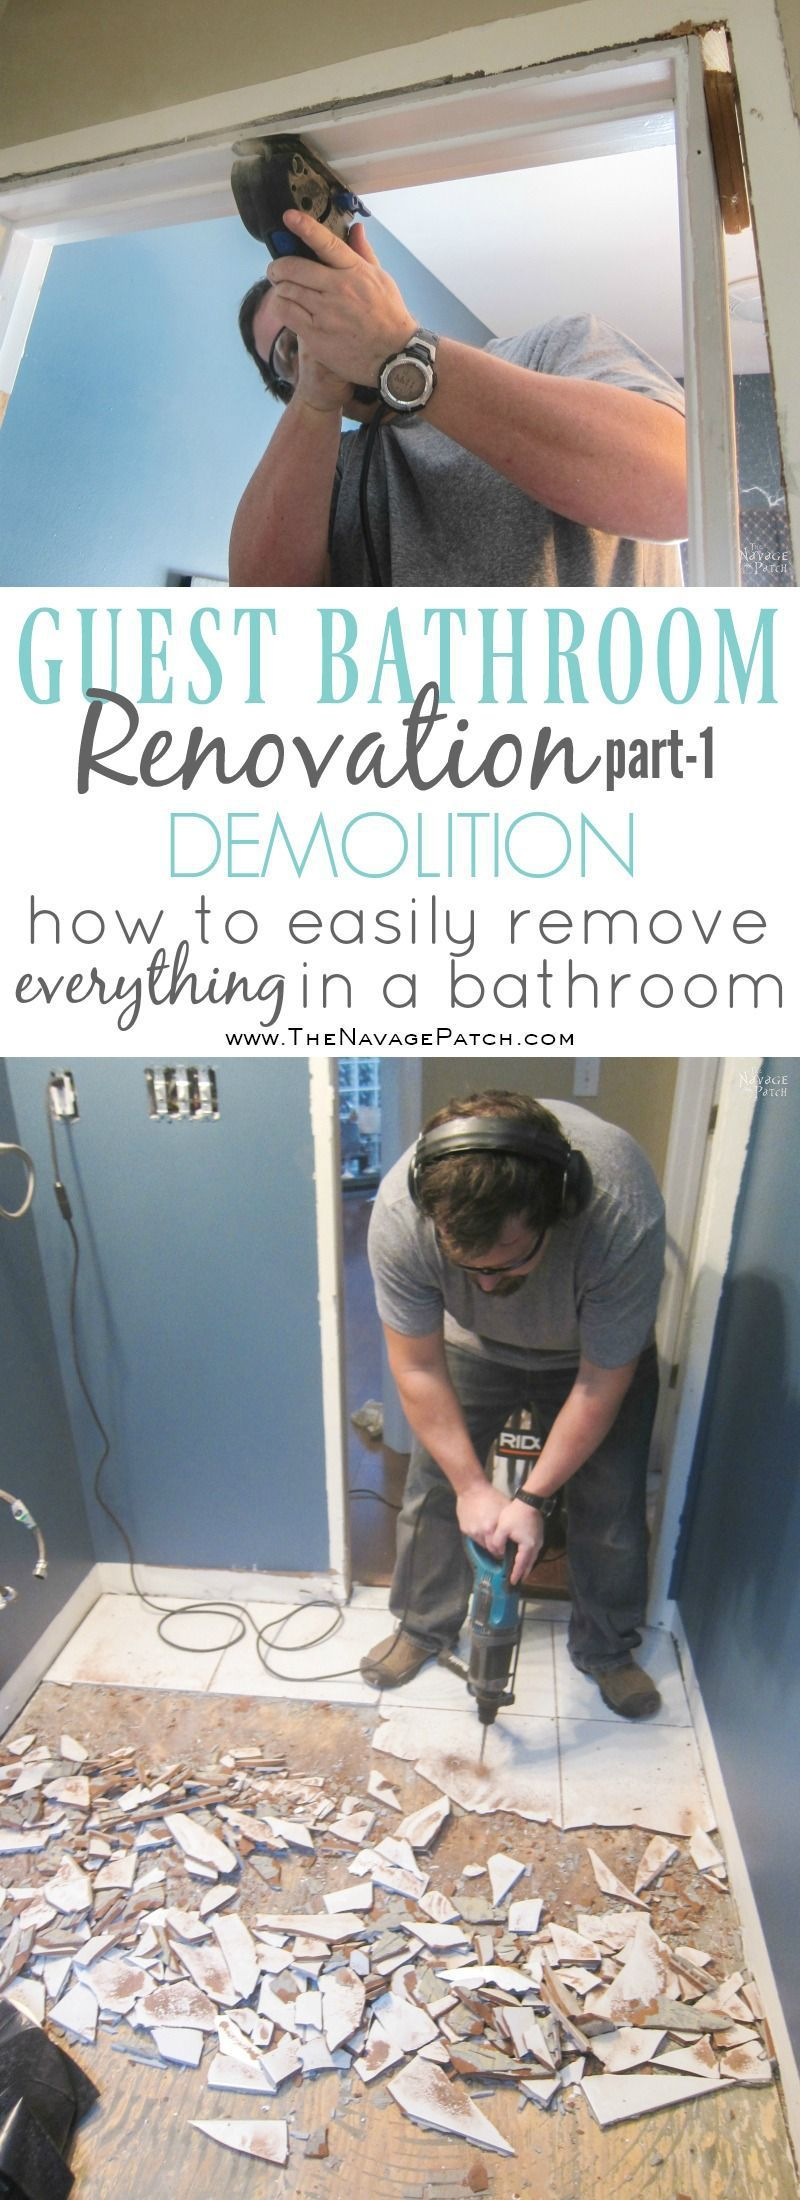 Guest bathroom renovation part 1 demolition baseboard tile guest bathroom renovation part 1 demolition dailygadgetfo Choice Image